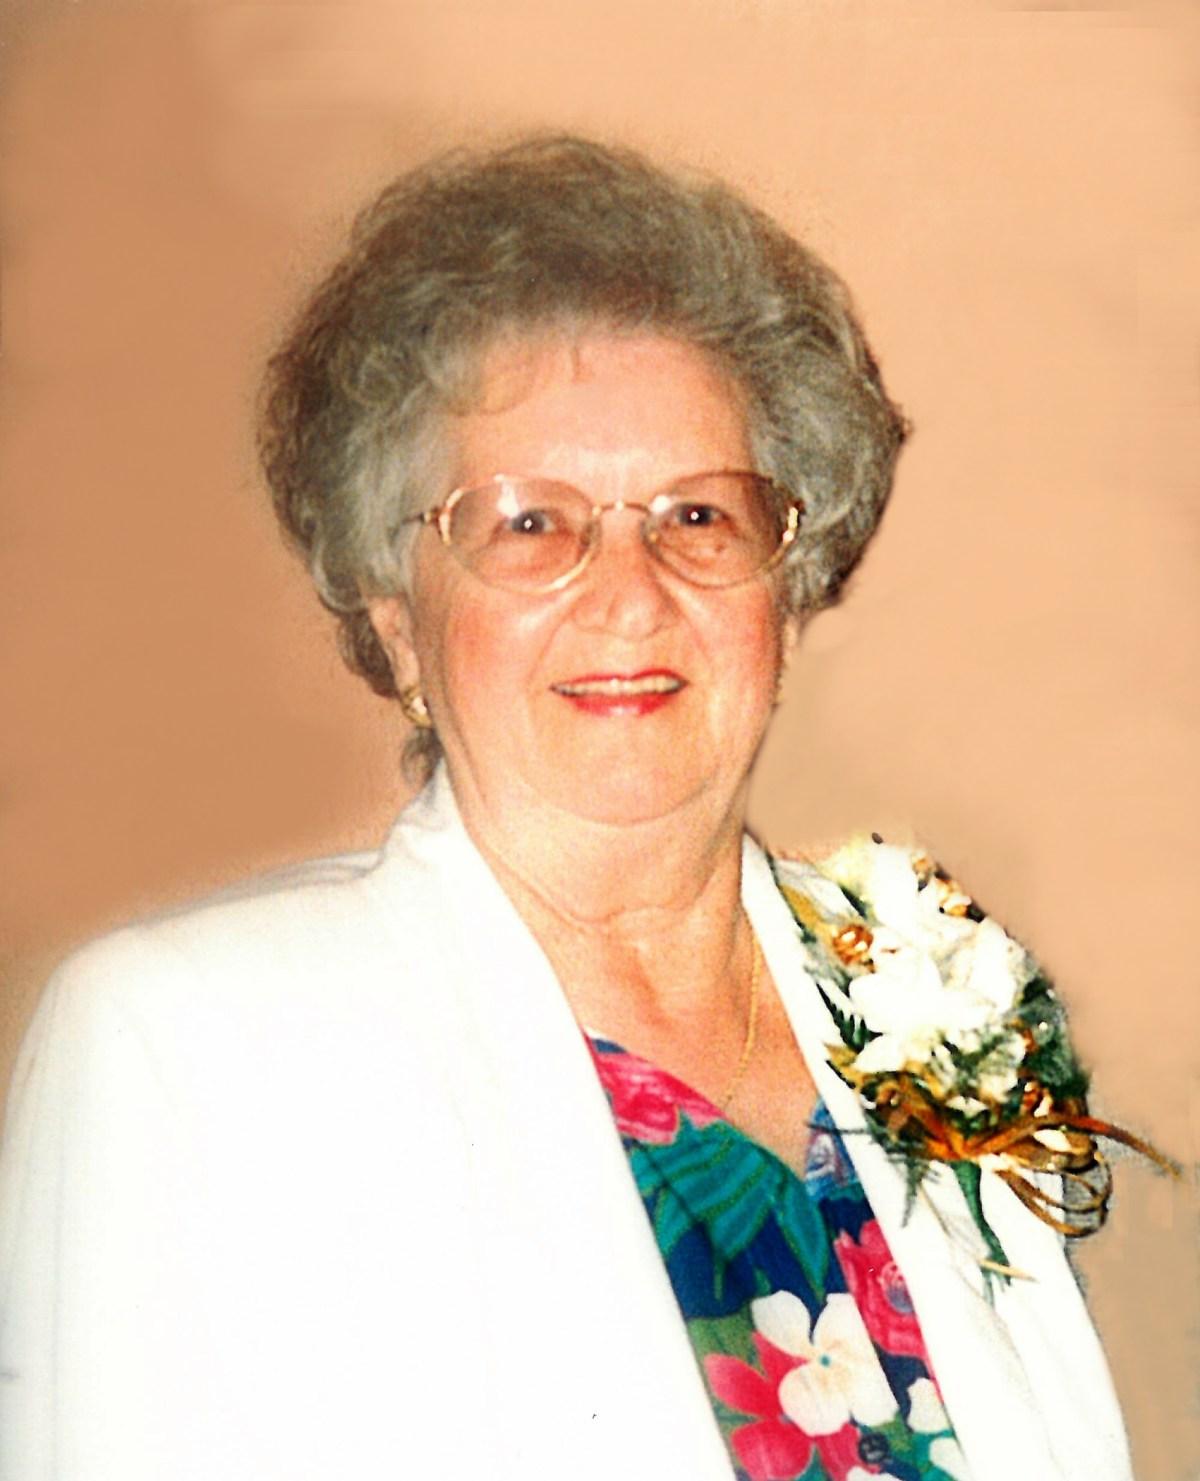 Obituary: Valerie Pavlik Enjoyed Square Dancing